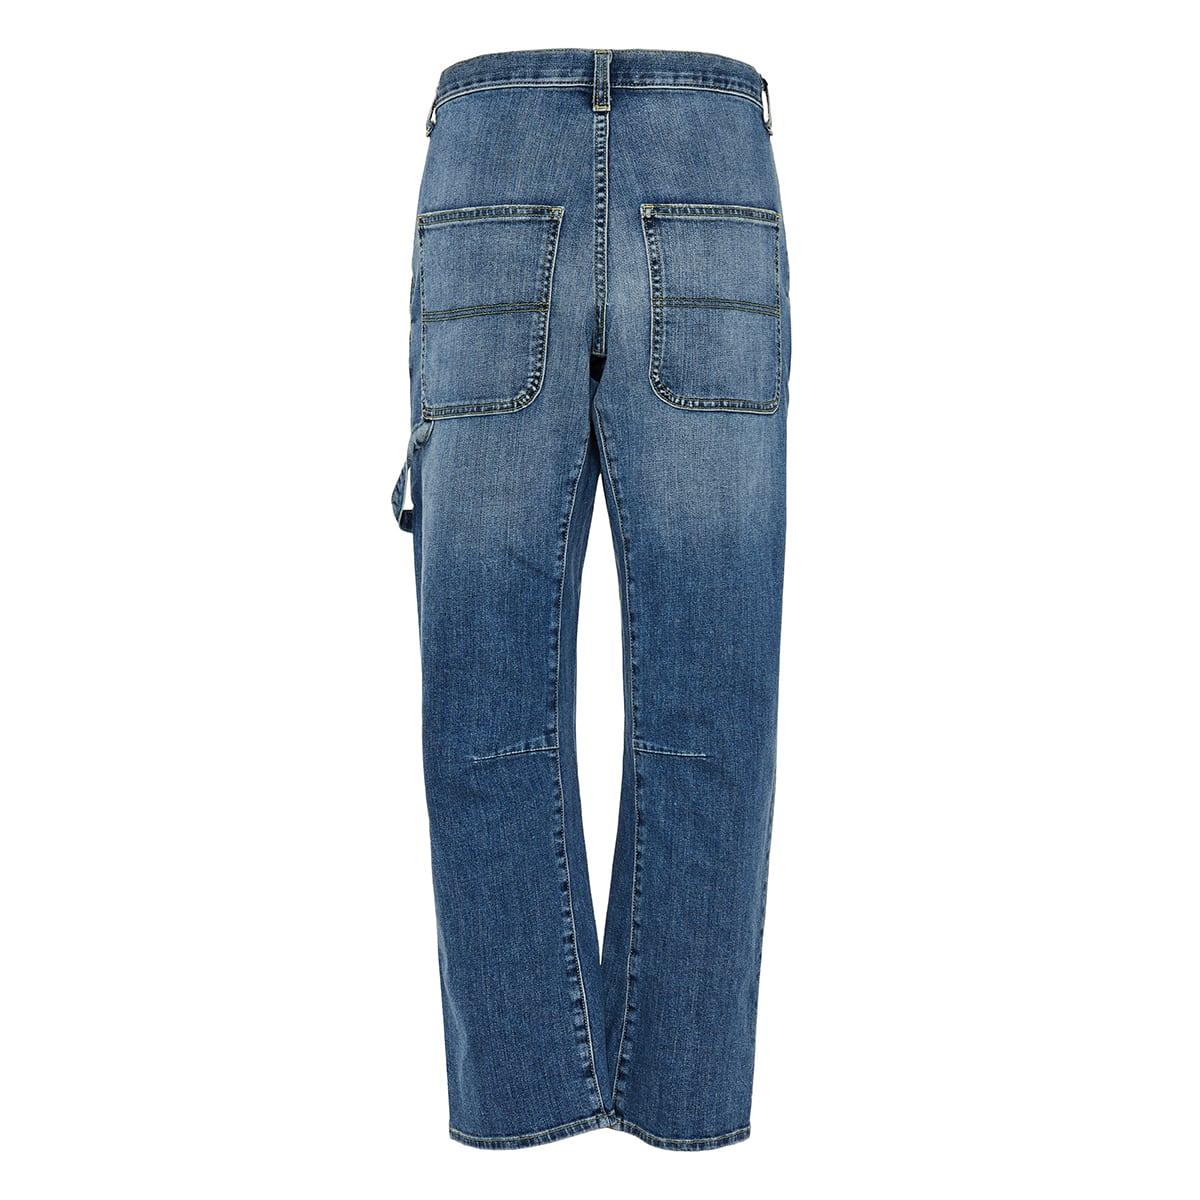 Carpenter loose-fit jeans